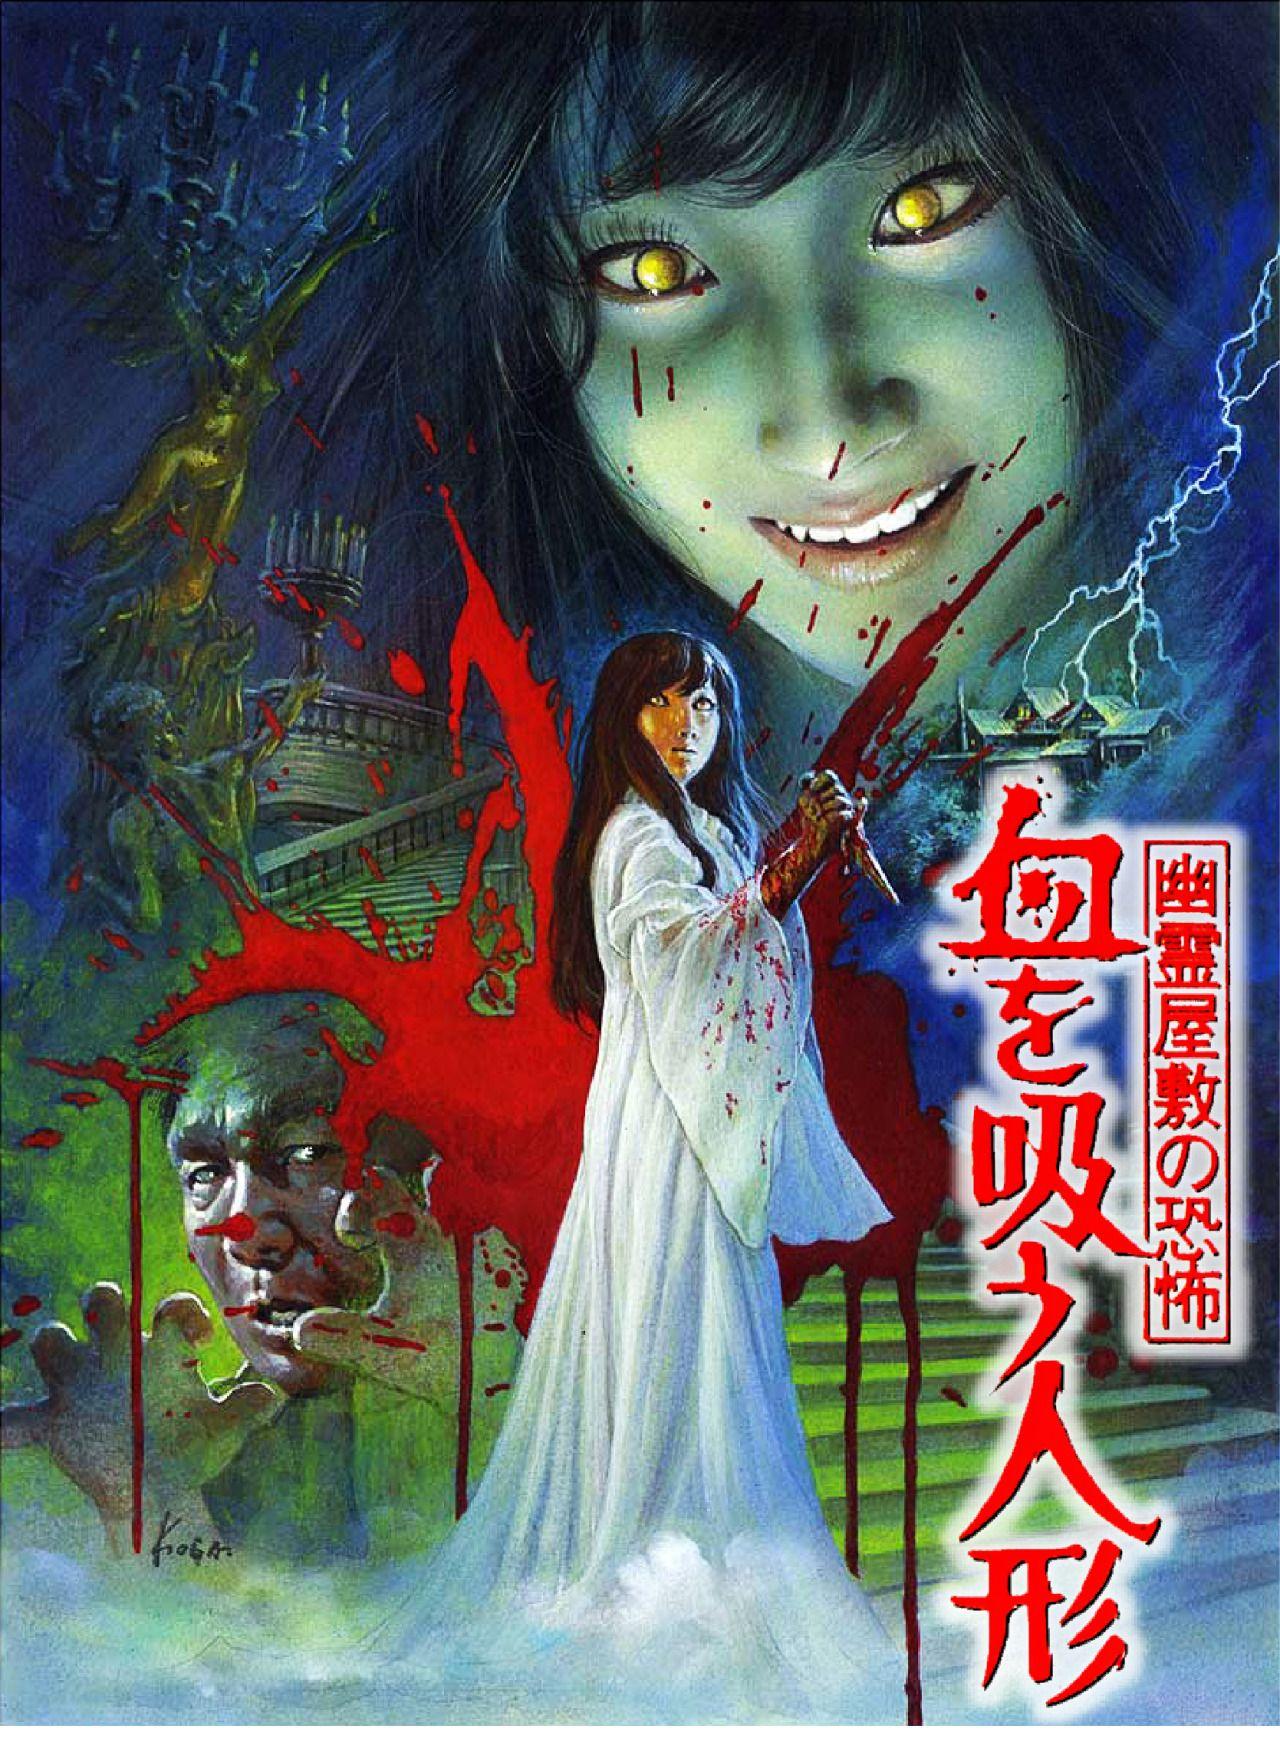 lifesimpermanence | Horror posters, Vampire film, Classic horror movies